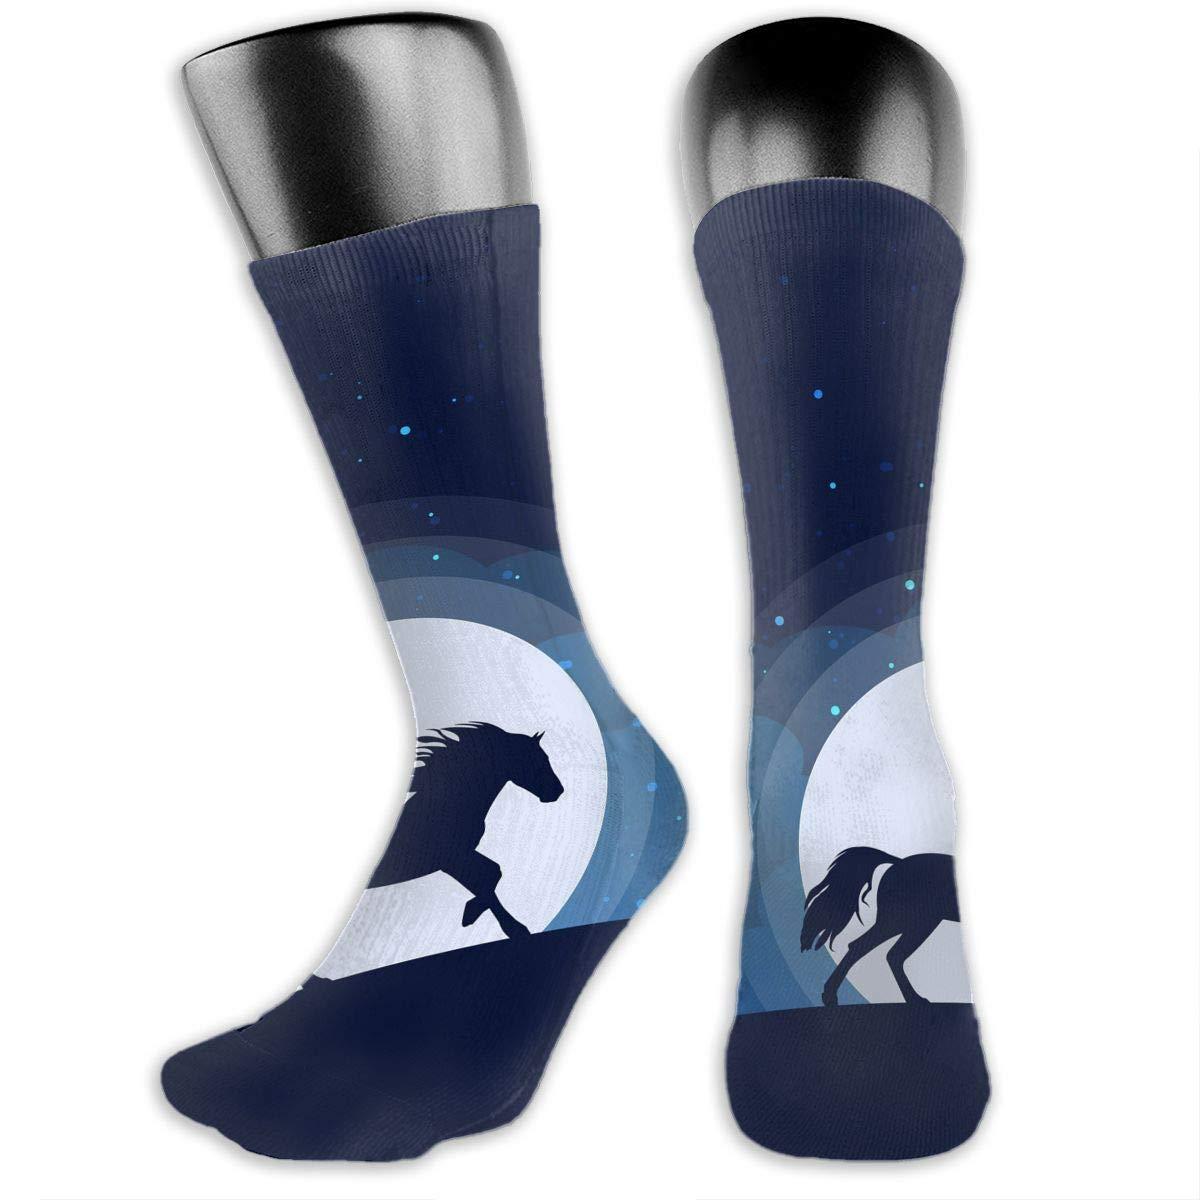 OLGCZM Moon Silhouette Blue Dark Horse Men Womens Thin High Ankle Casual Socks Fit Outdoor Hiking Trail